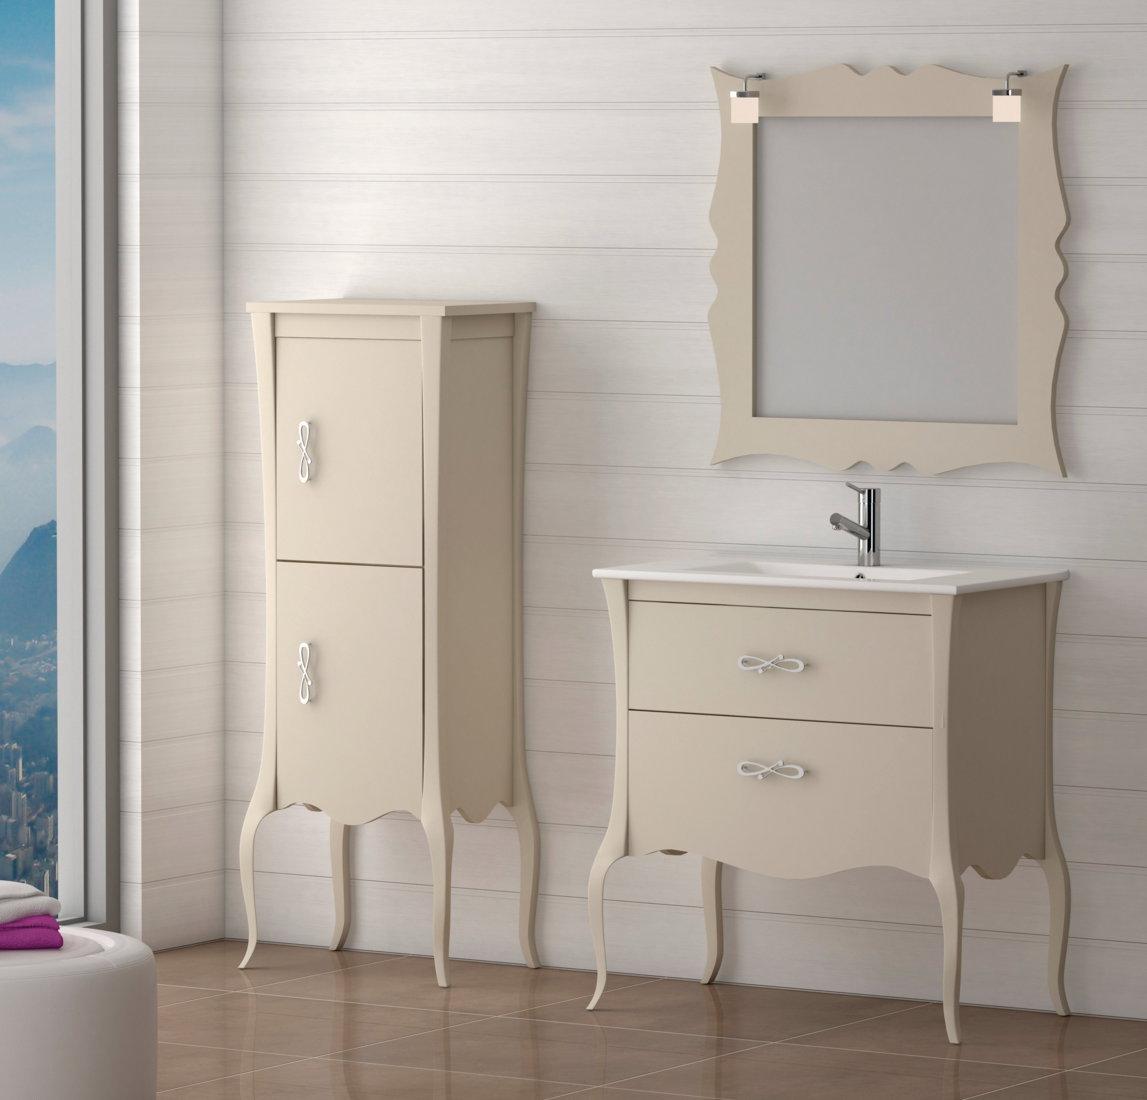 Batoni mueble de ba o de madera modelo niza camel - Muebles de bano de madera ...